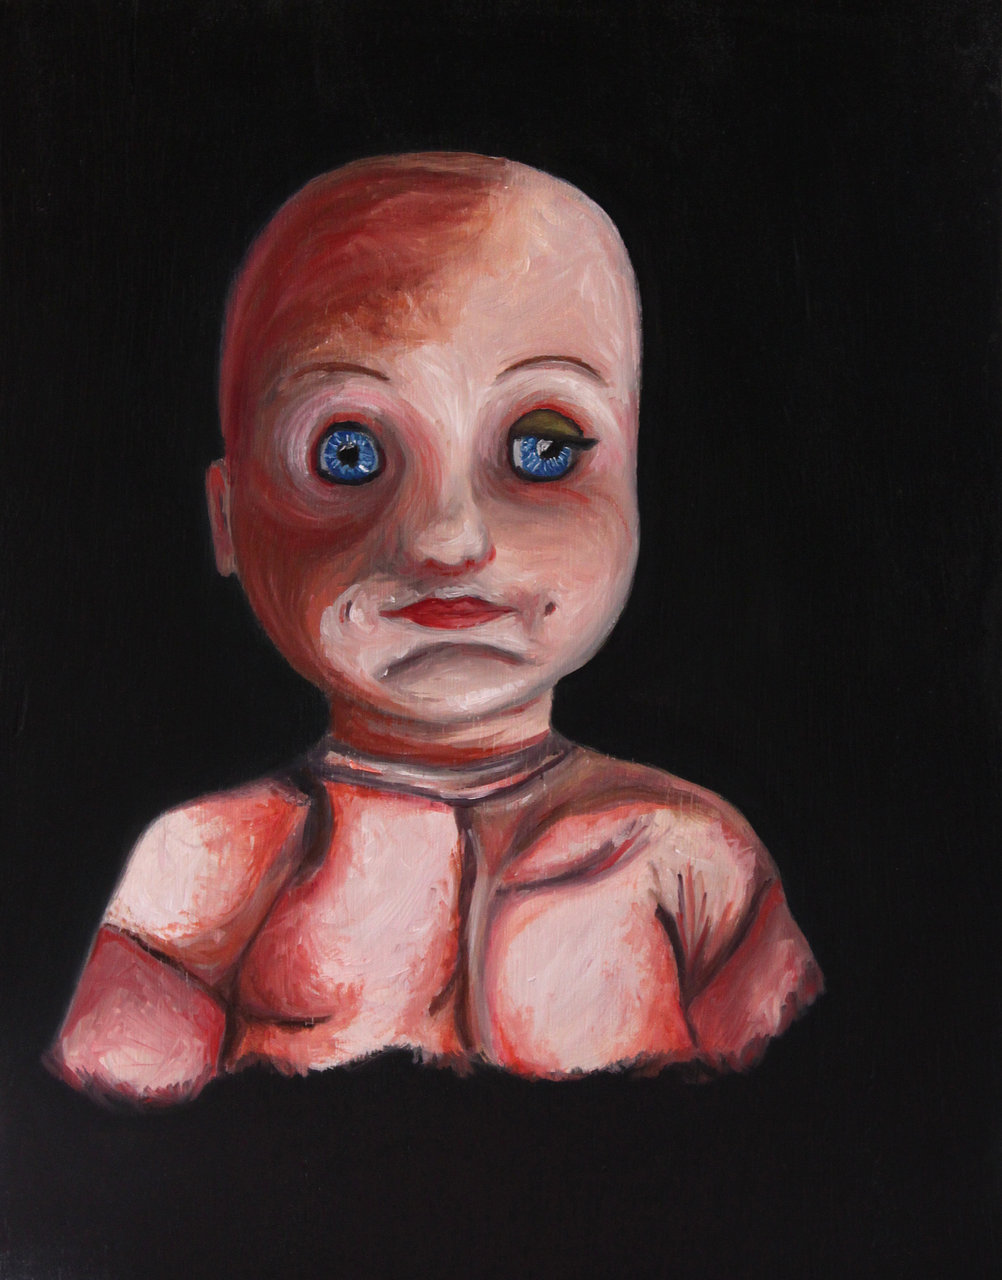 Doll Head Study